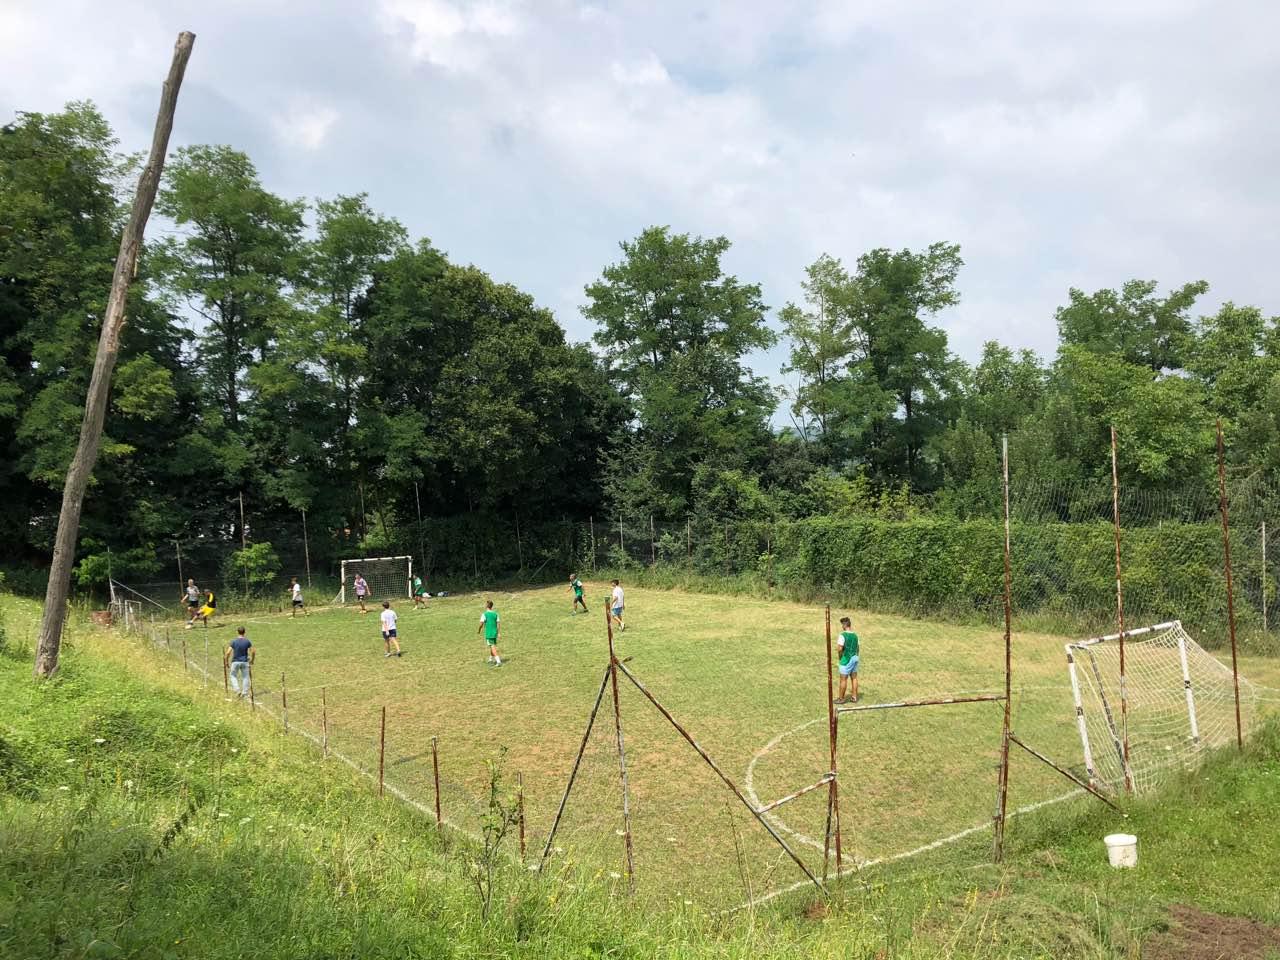 Sportski teren, foto: M. Miladinović